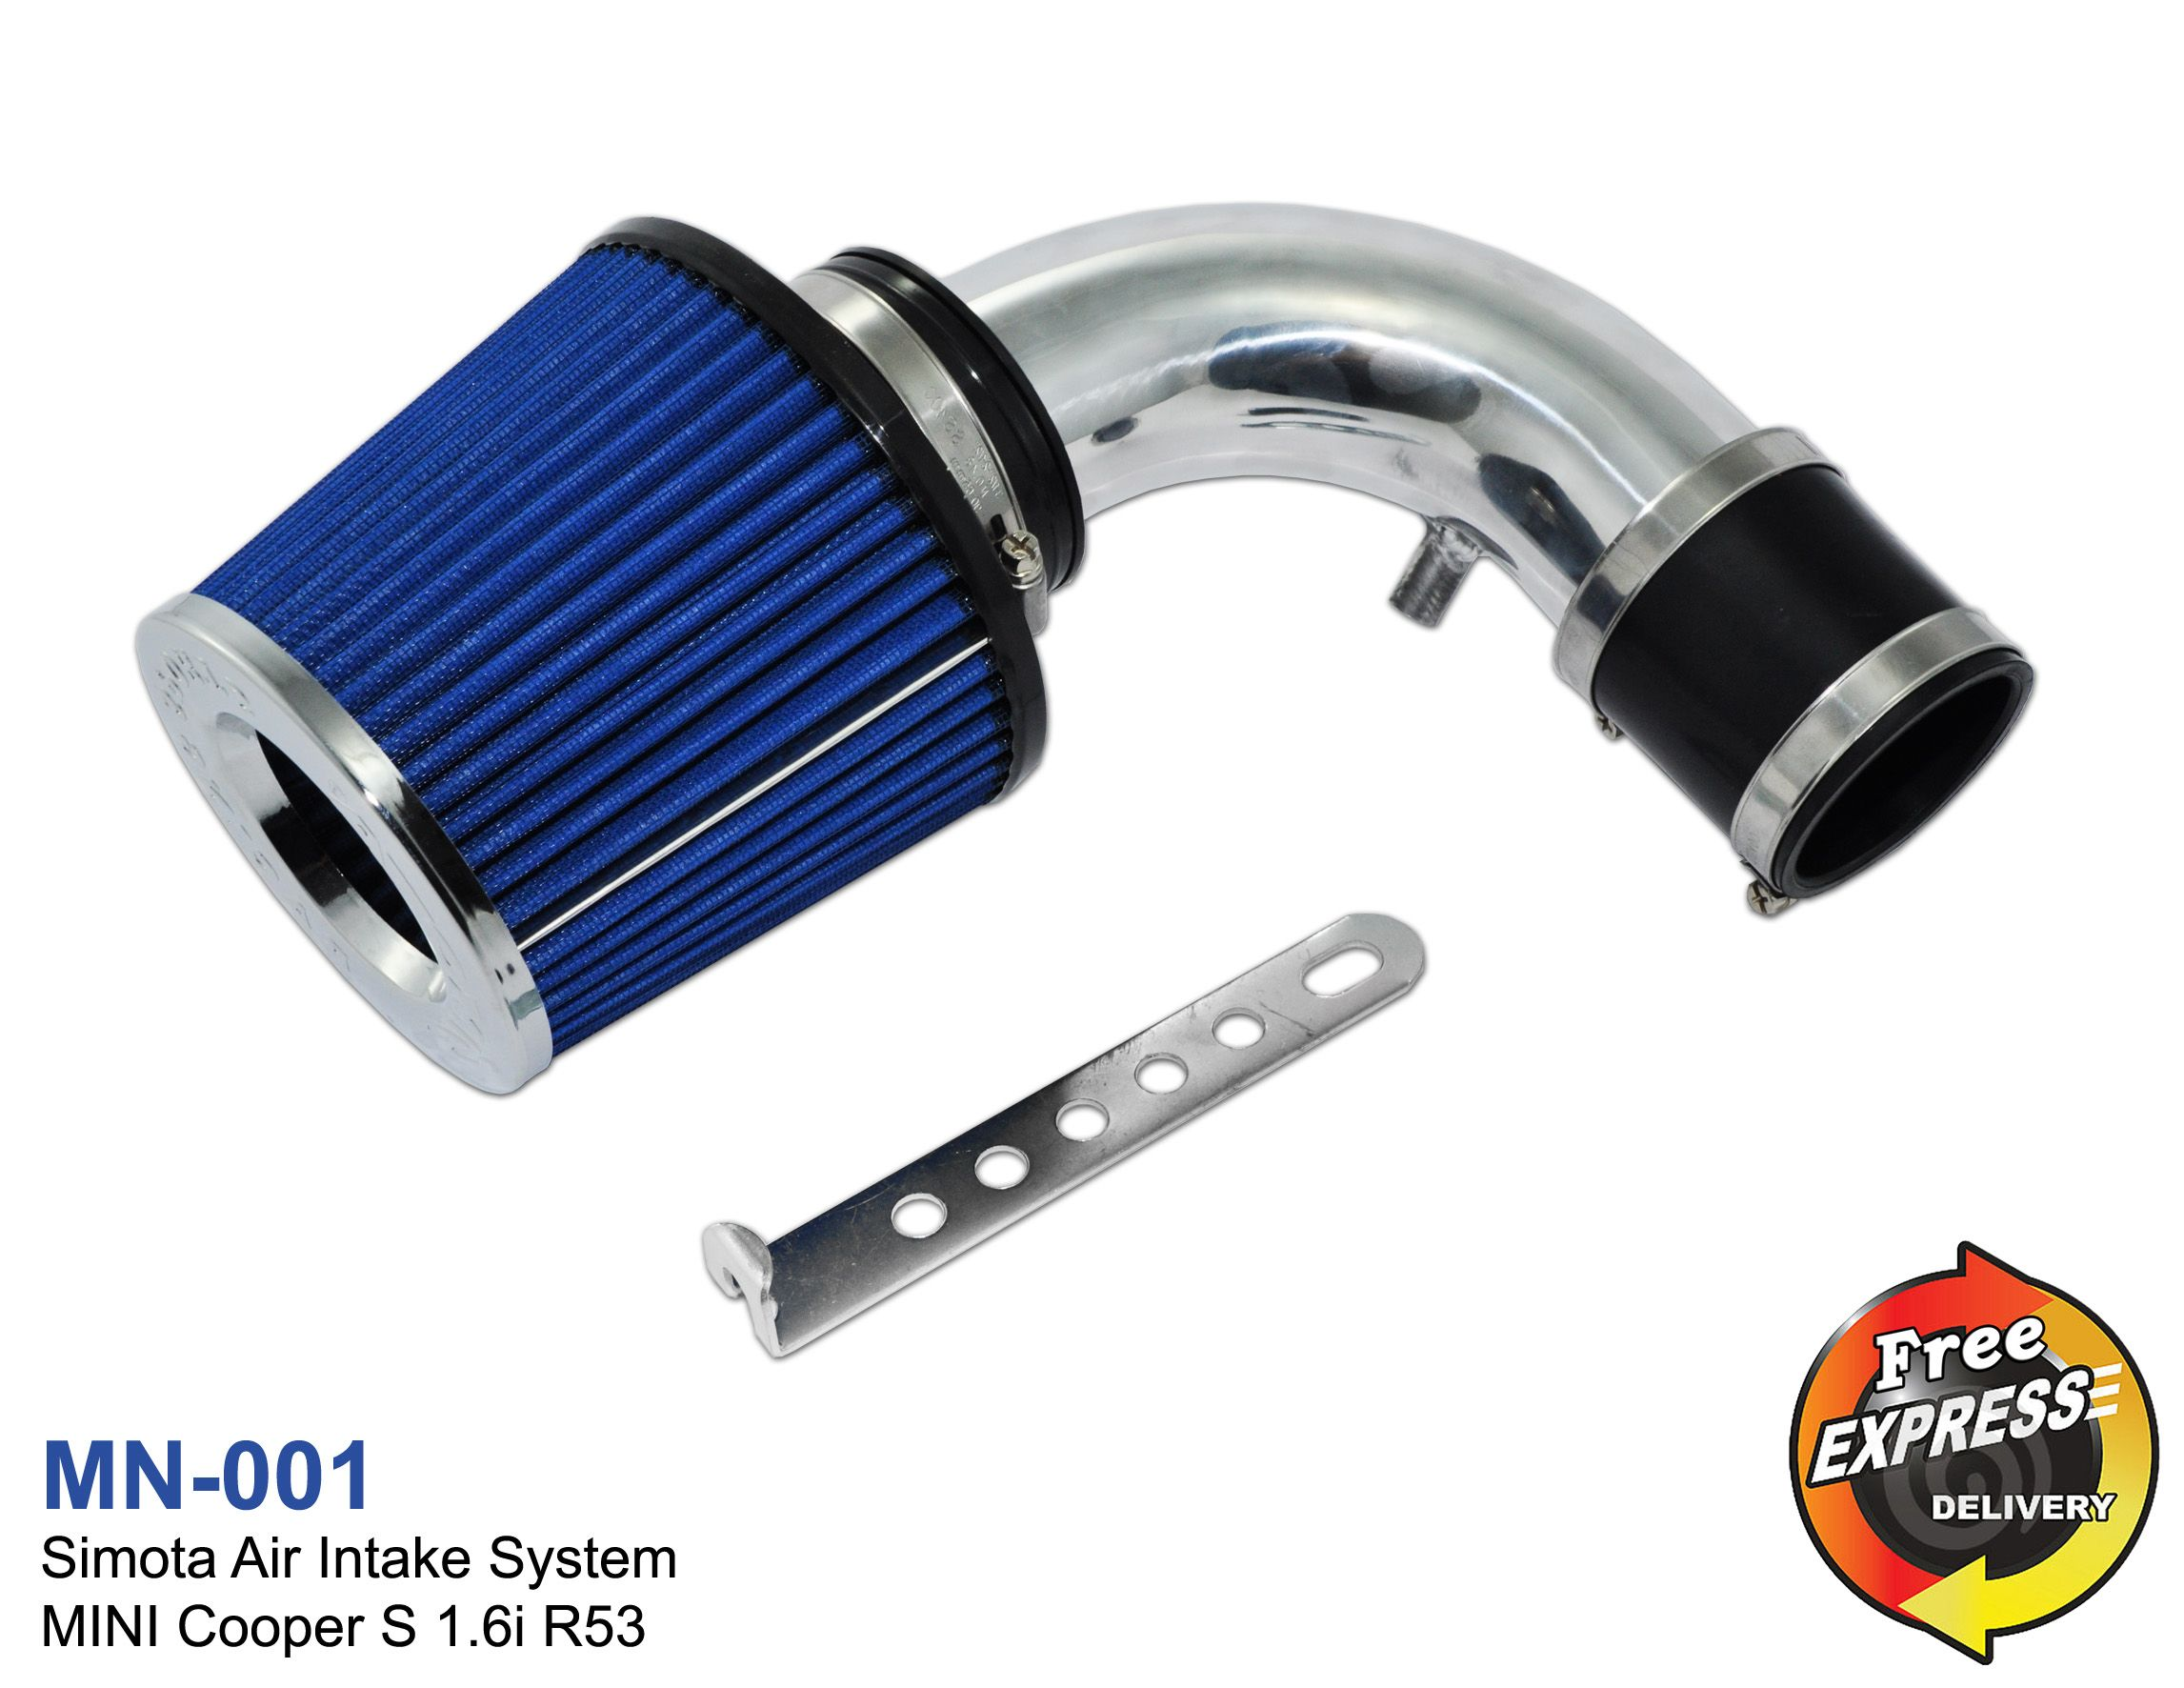 Air Intake System For Mini Cooper S 1 6i R53 Mini Cooper S Mini Cooper Mini